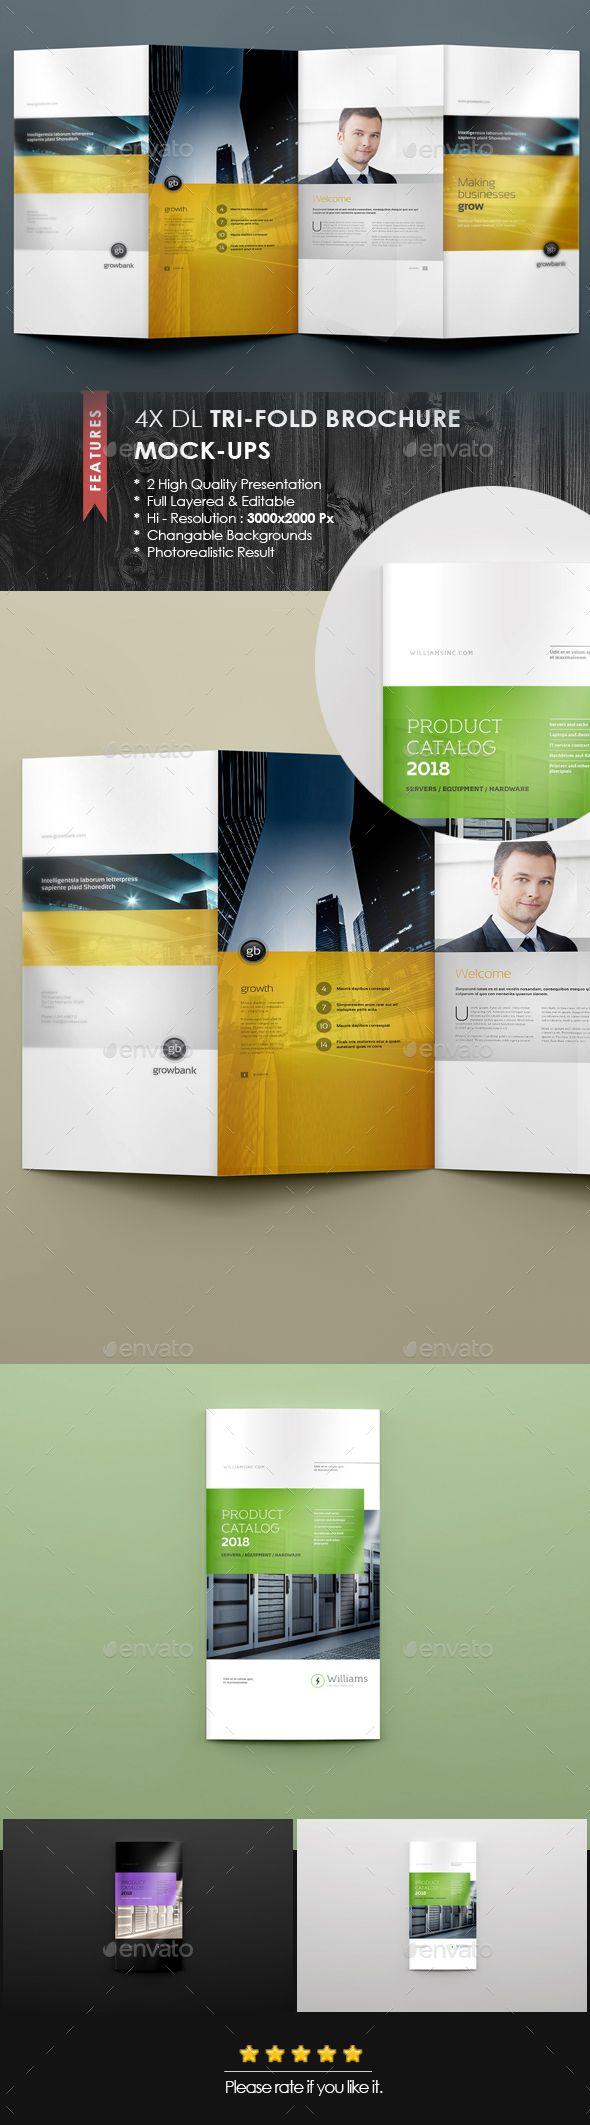 4xdl Double Gate Fold Brochure Mock Up 6 Print Mockup Brochure Graphic Design Templates